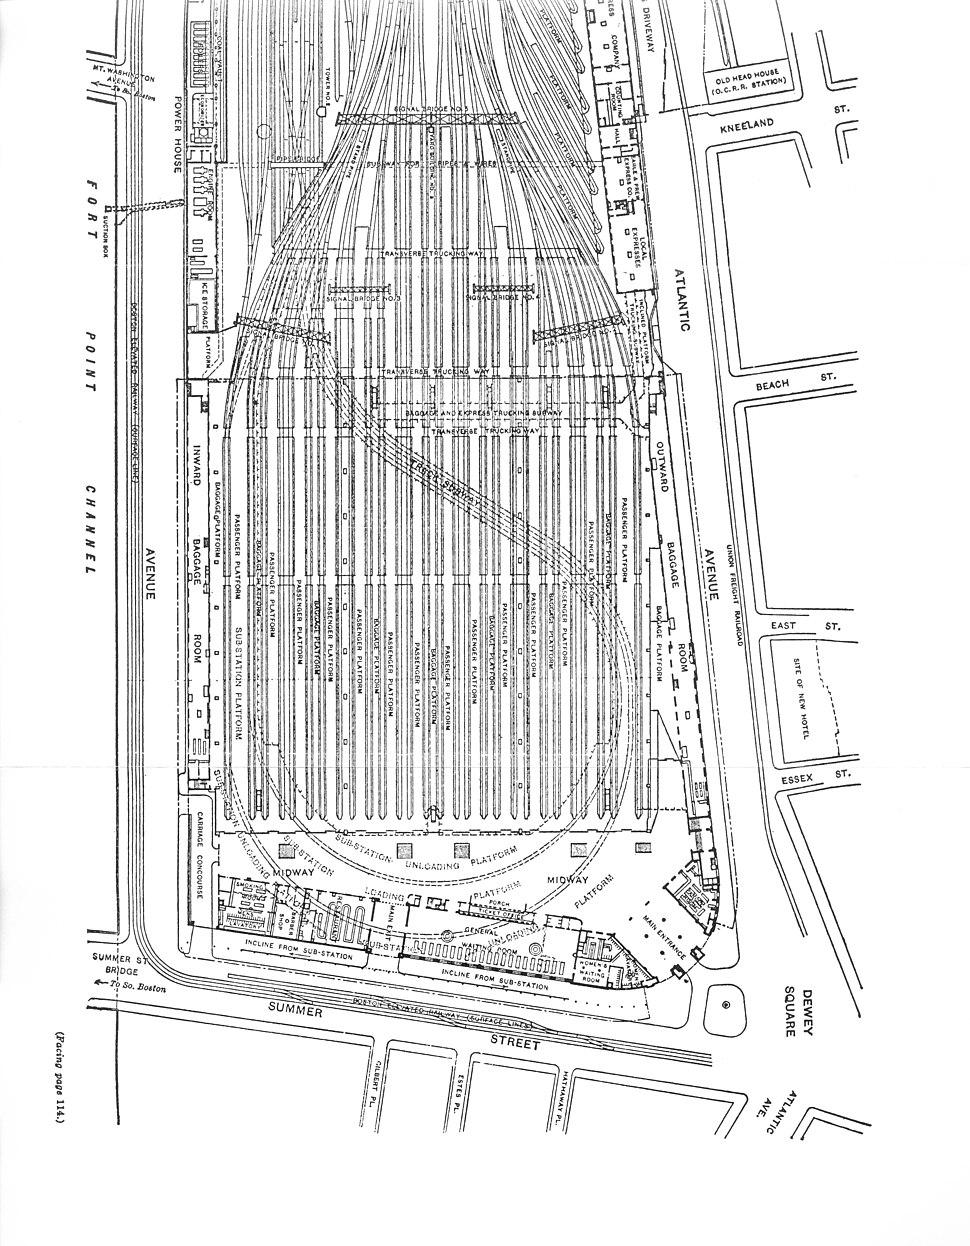 Boston South Station diagram